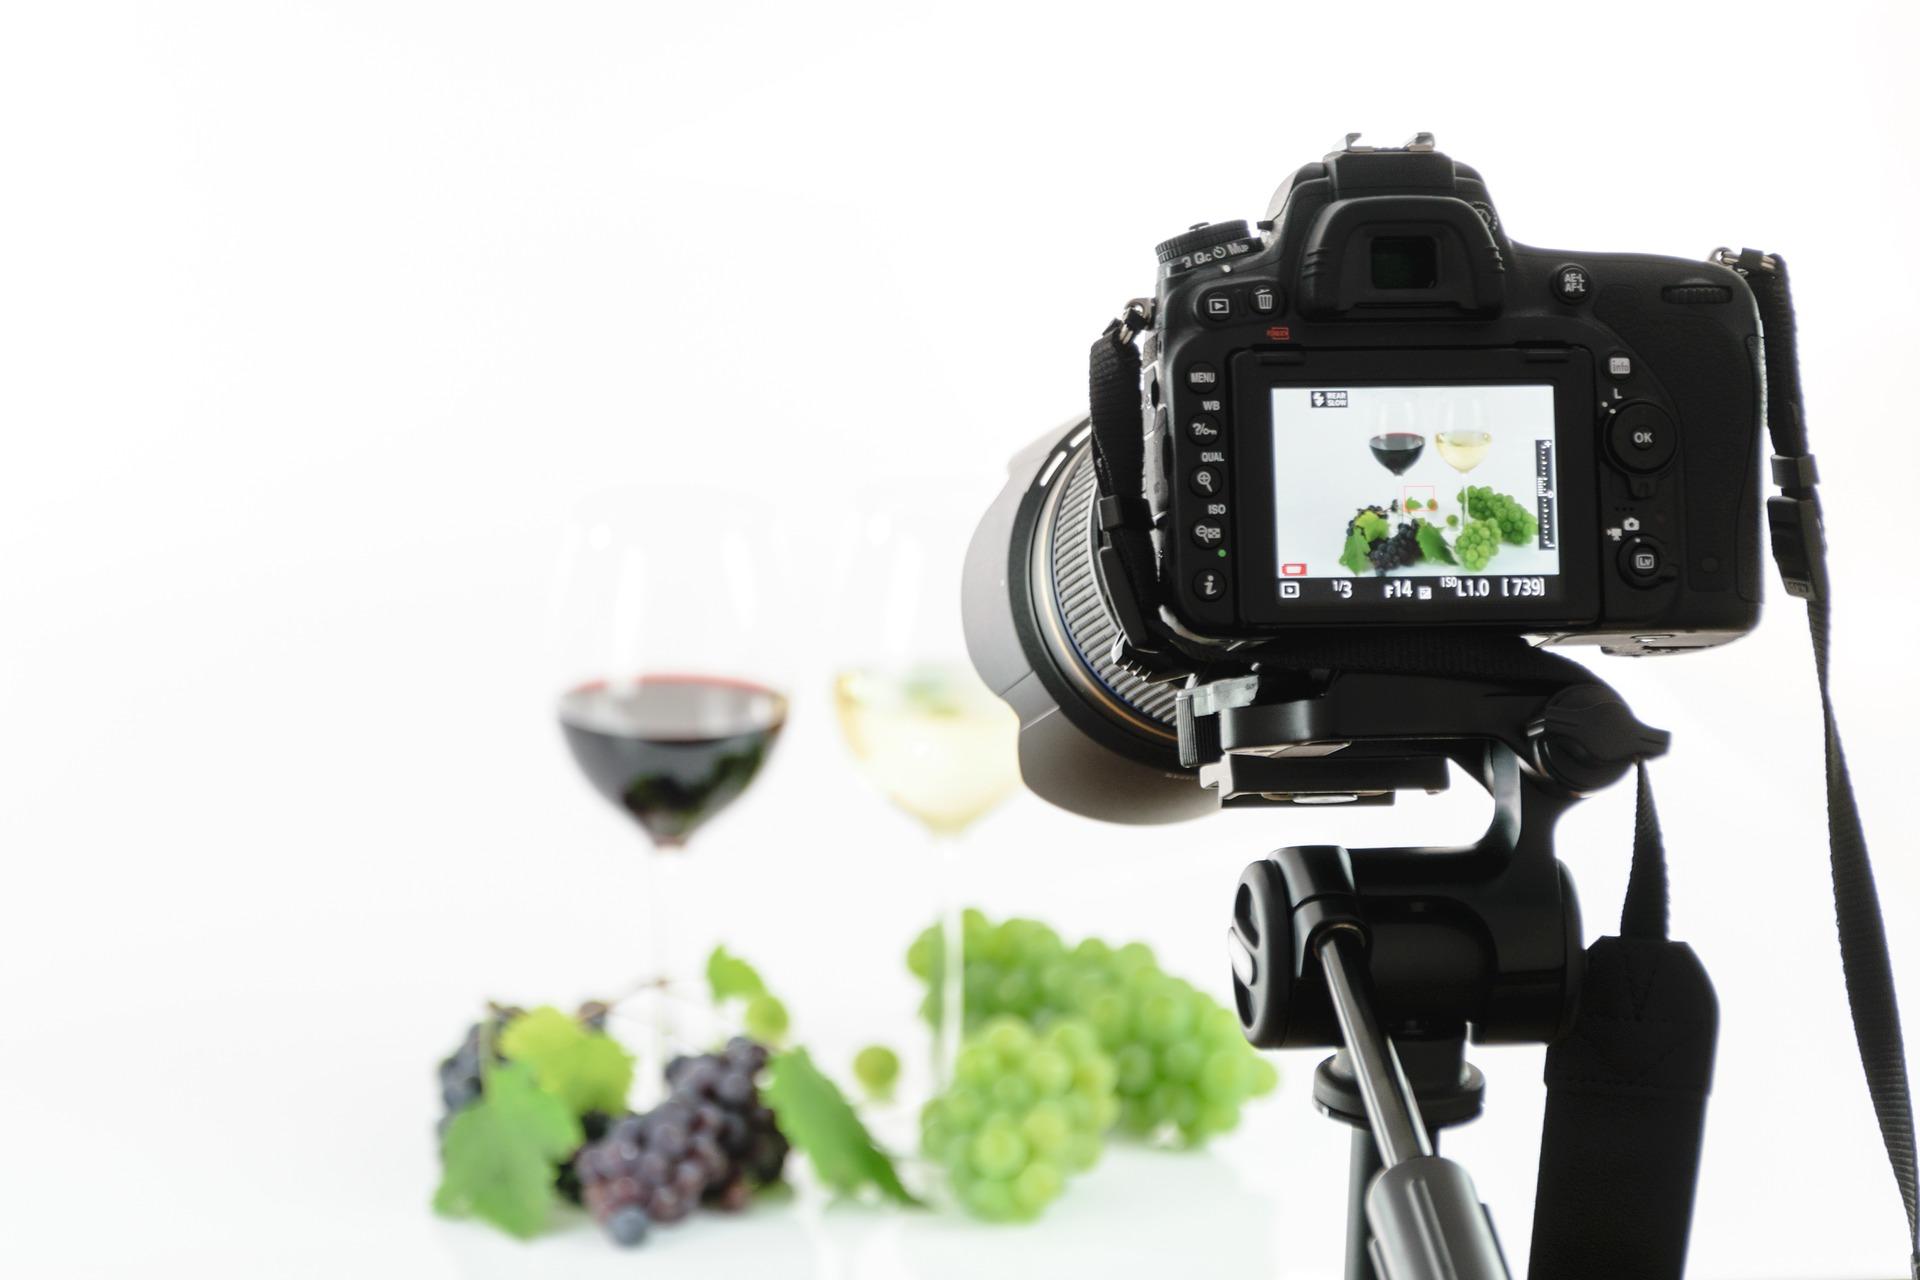 Camera taking photos of food